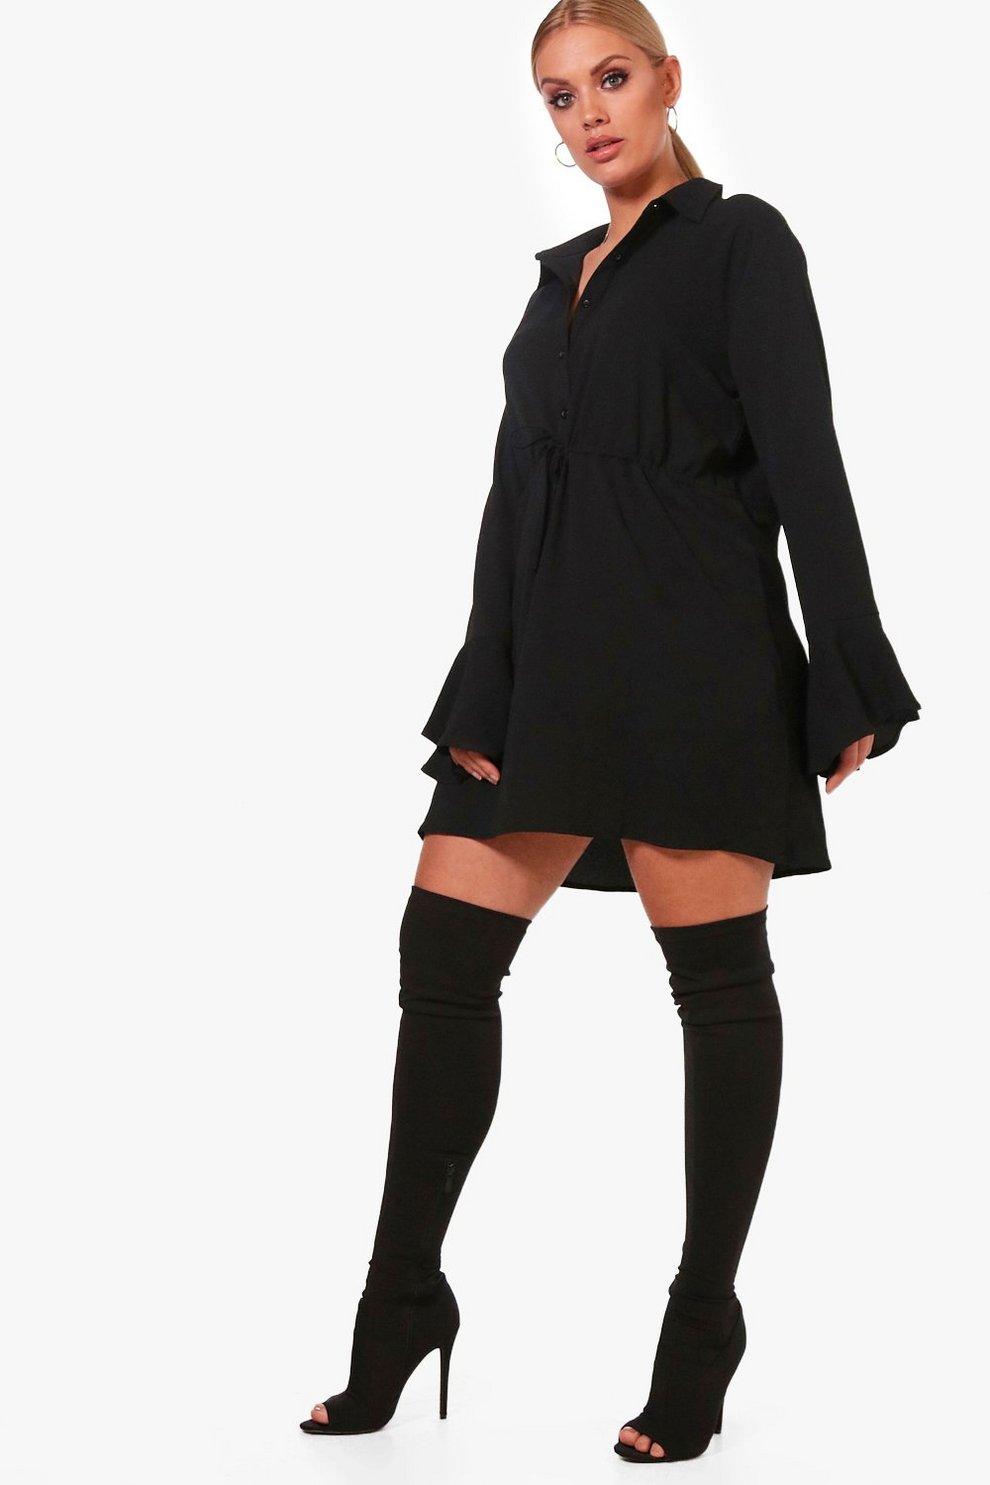 Boohoo Plus Drawcord Waist Fluted Sleeve Shirt Dress Buy Cheap New Styles Footlocker Finishline Online For Cheap Cheap Online jVeryCB4WE